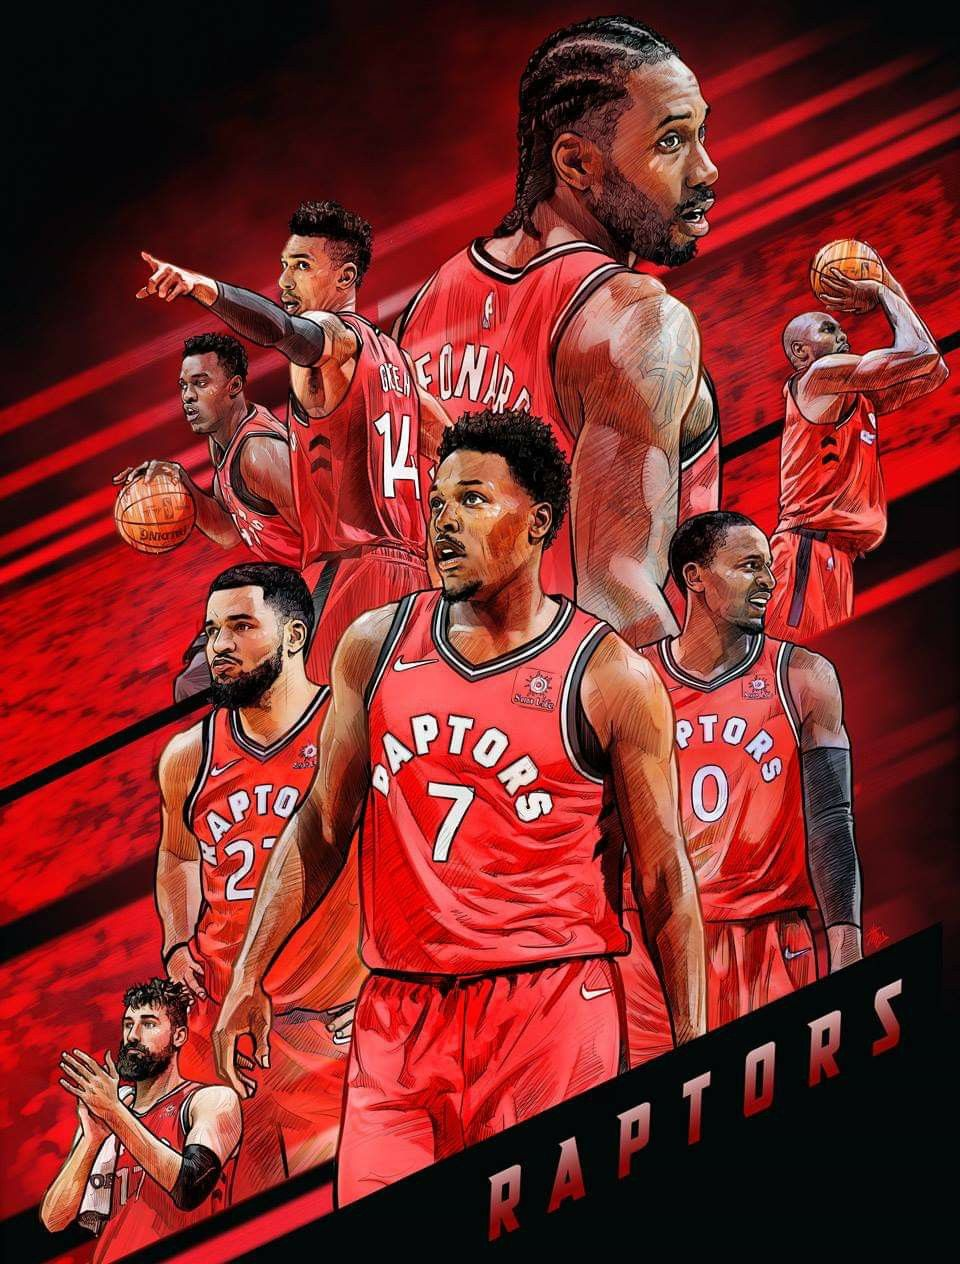 Pin By Brian Gridley On Nba Cool Arts Toronto Raptors Basketball Raptors Basketball Basketball Players Nba